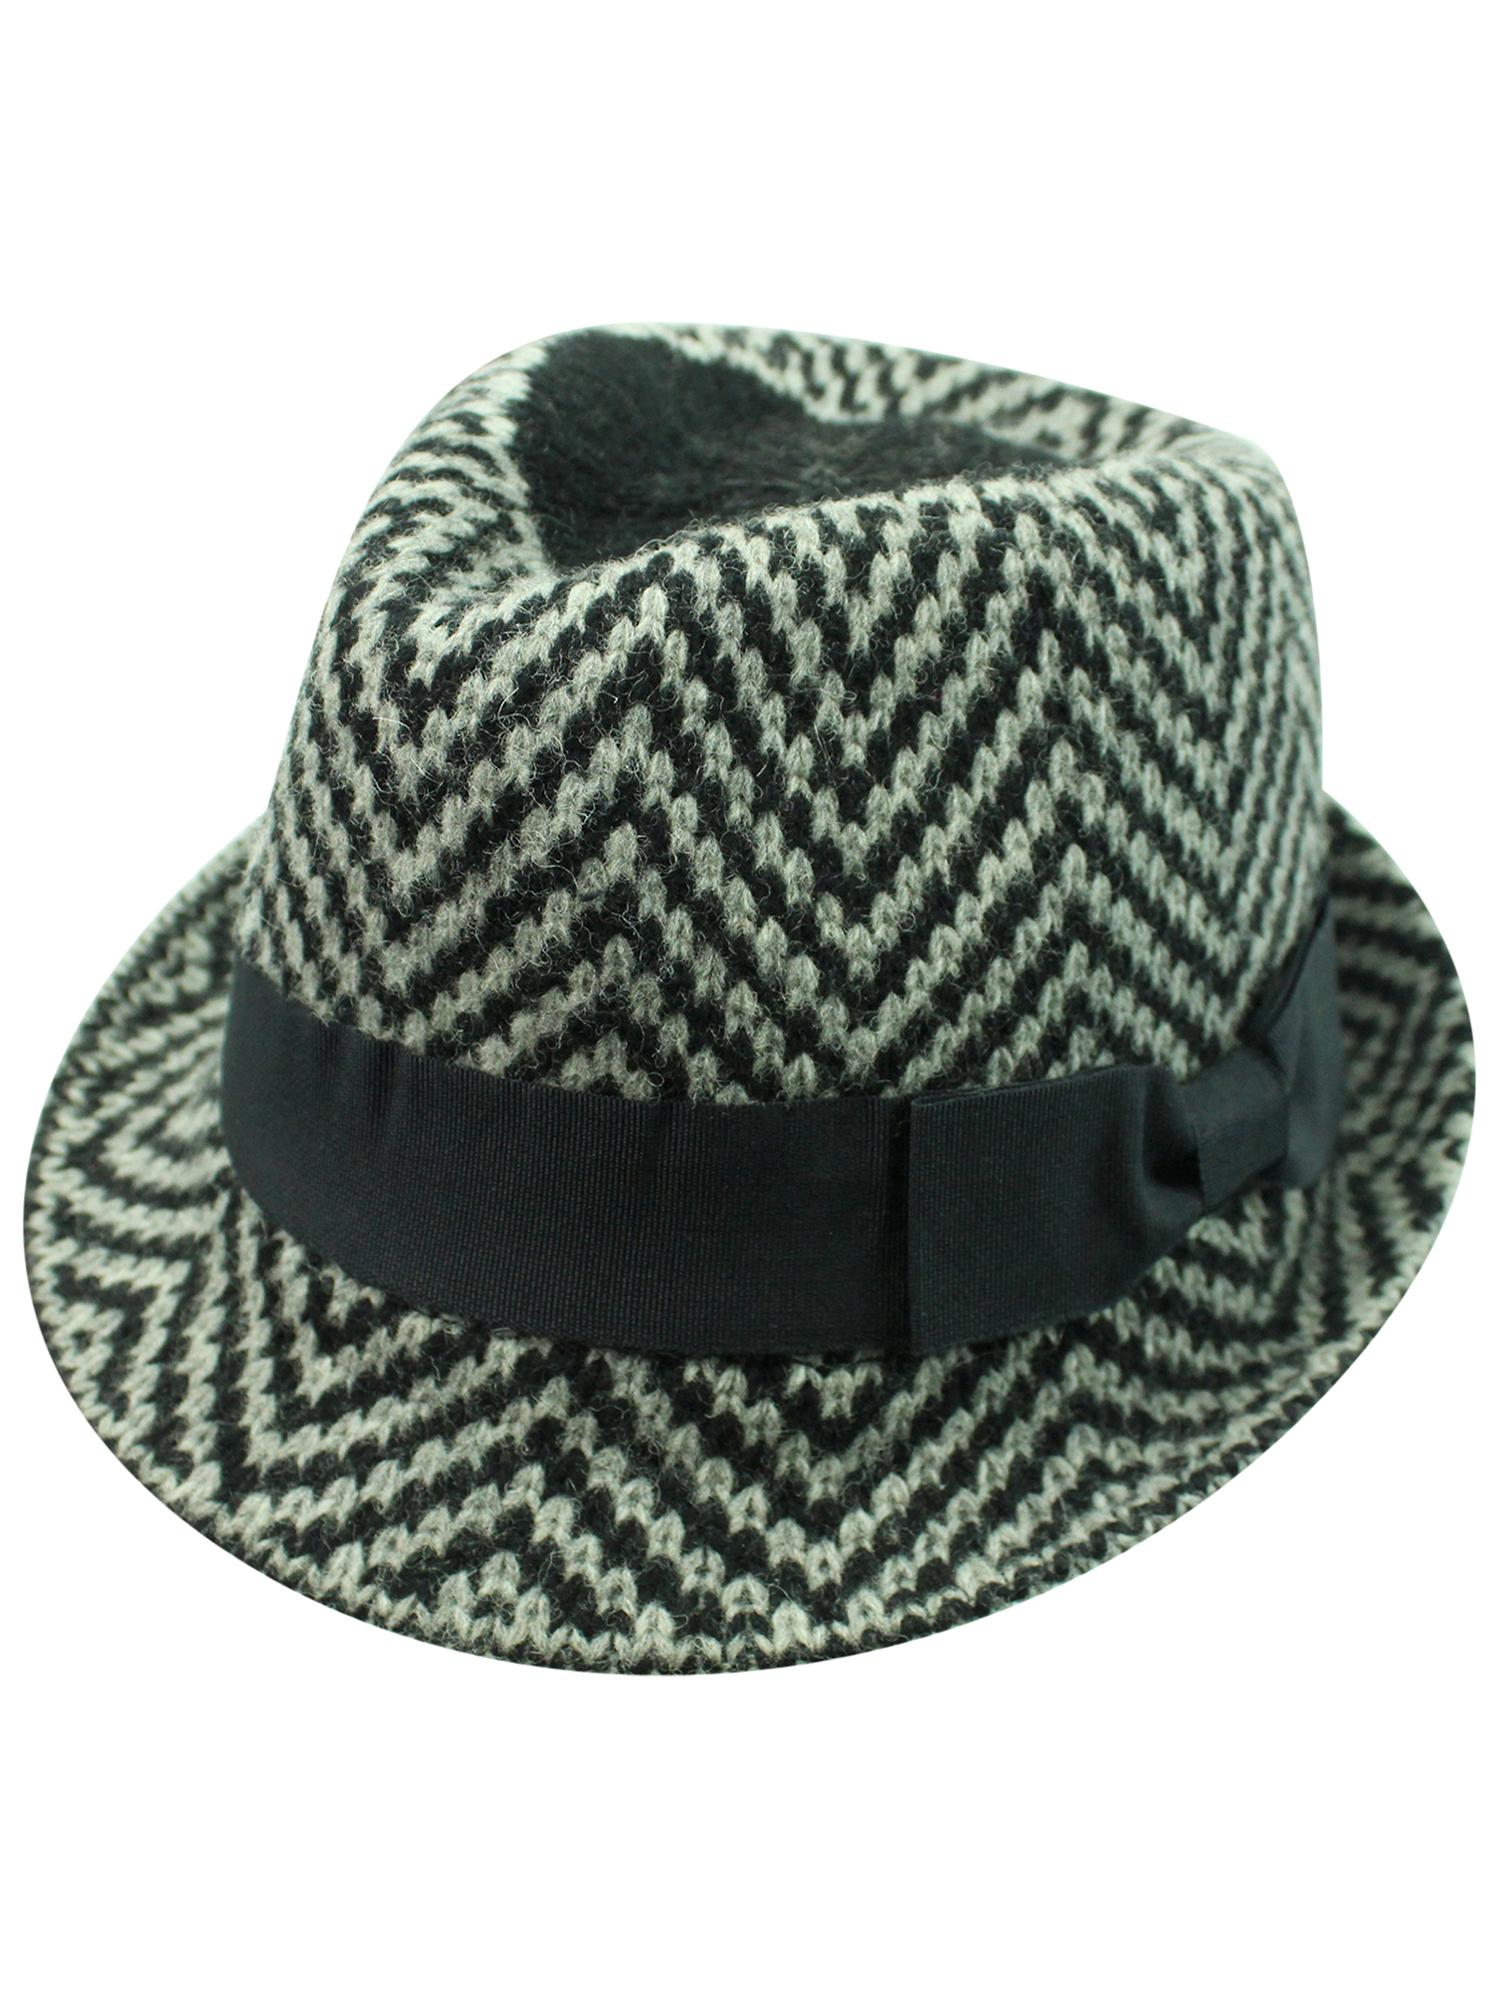 699dba0f5 Details about ZIGZAG ANGORA WOOL FEDORA HAT